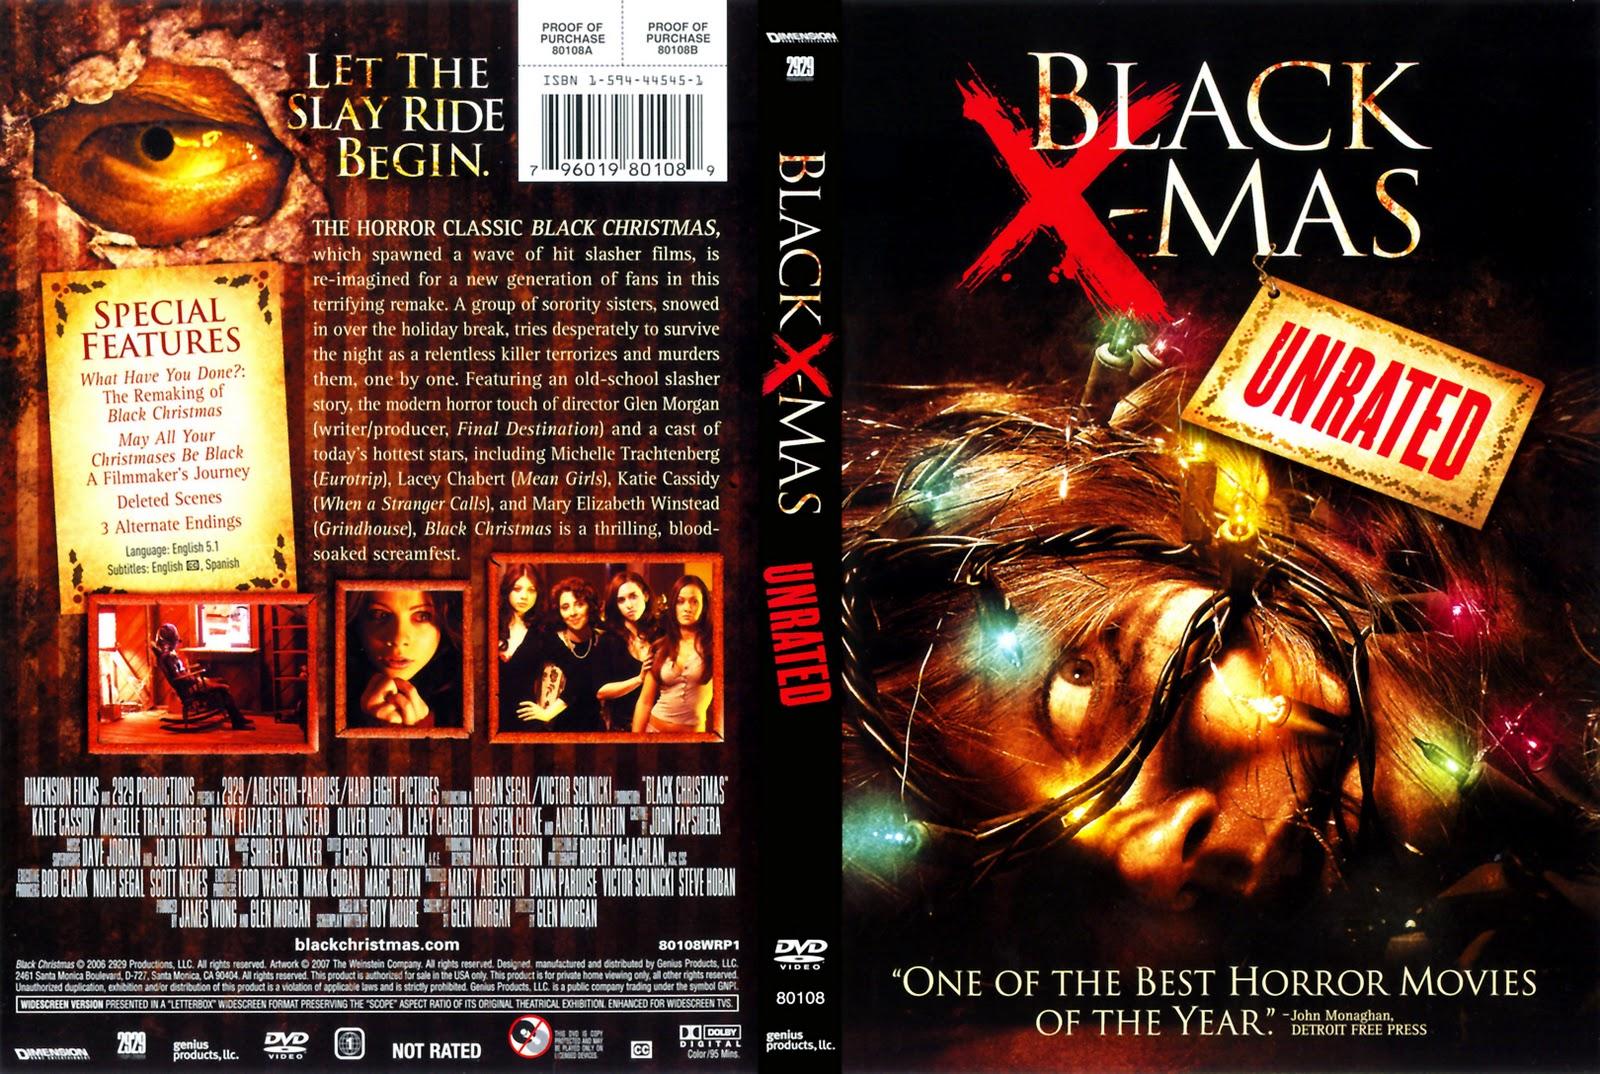 Black_x_mas.jpg